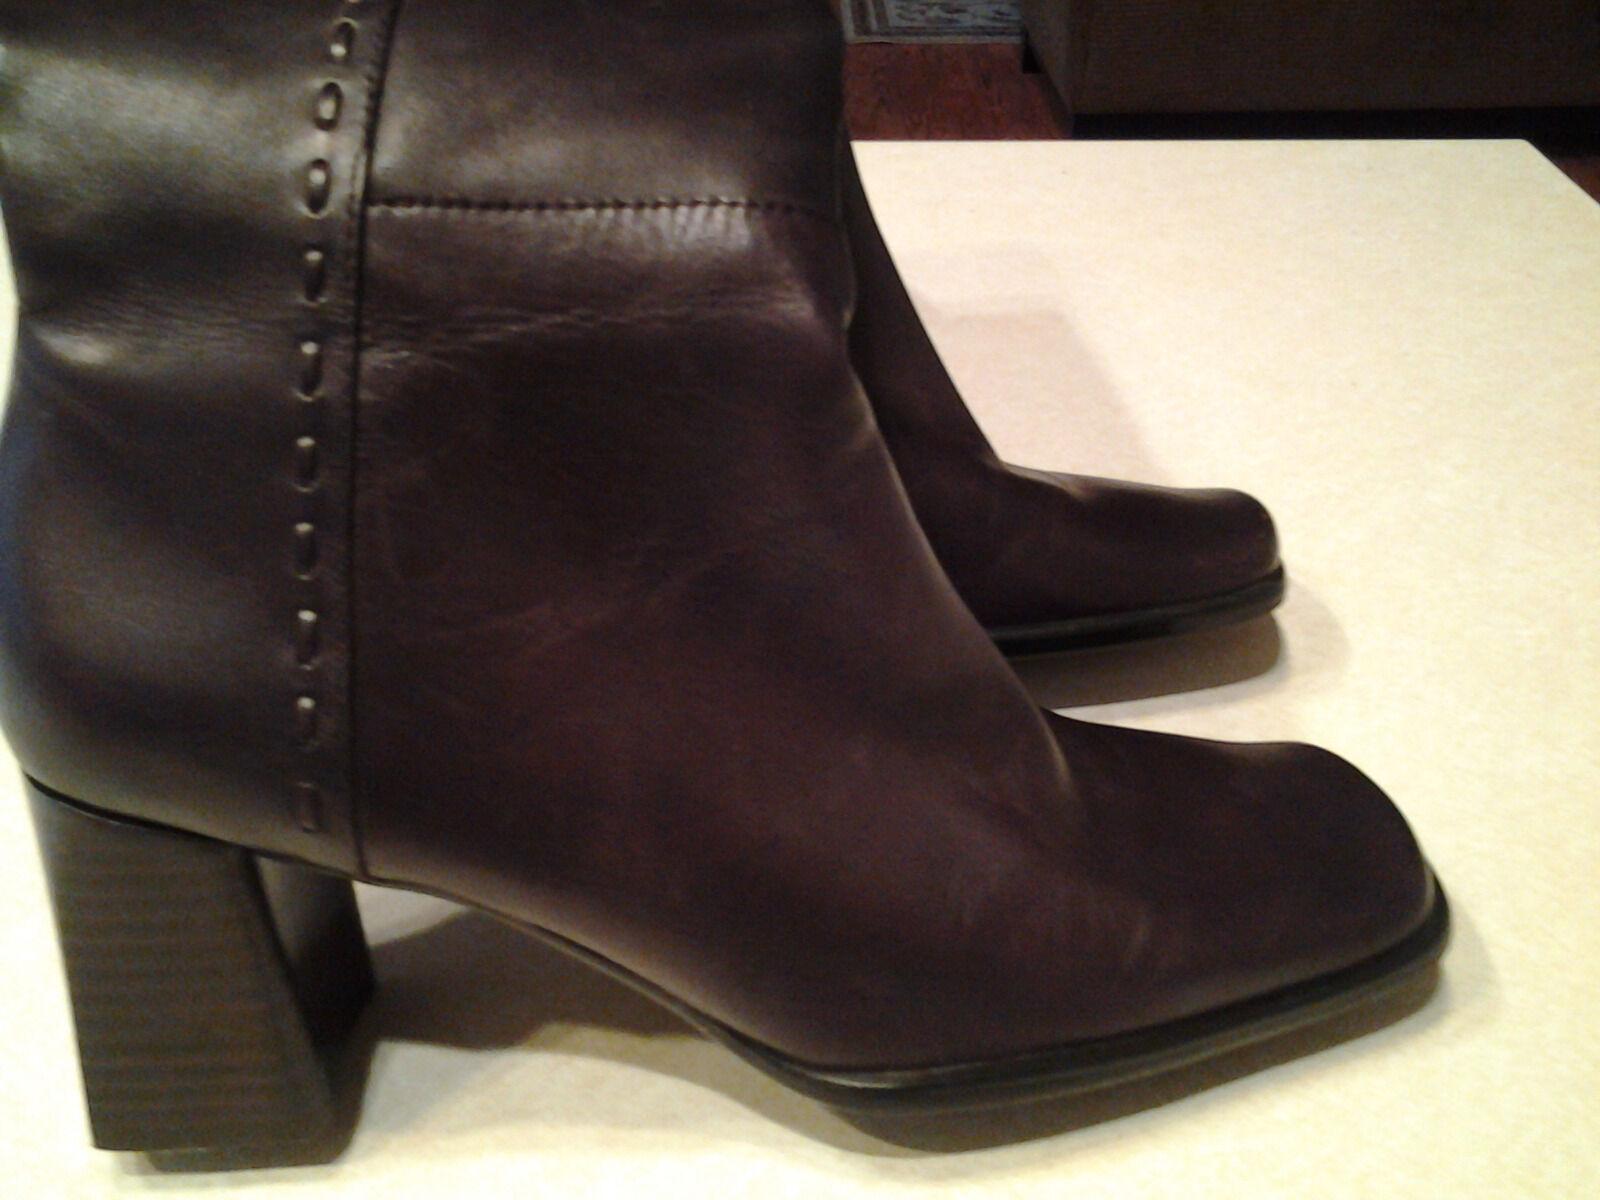 "Bandolino women's leather knee high boots 3"" high heels side  zipper Brown 8.5M"